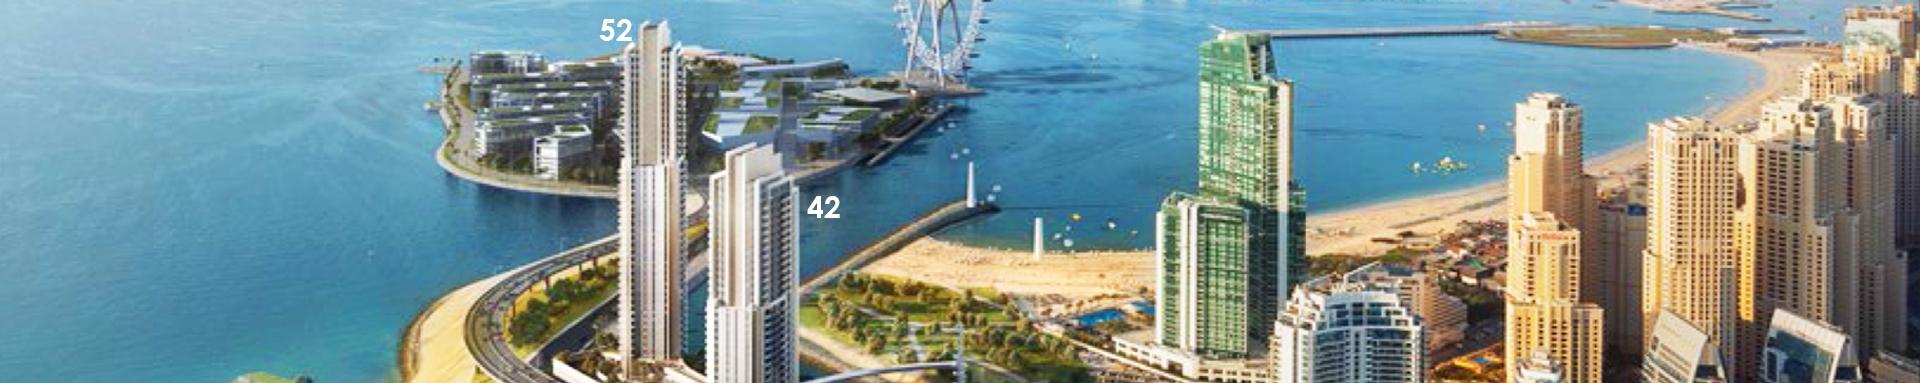 52 42 Dubai Marina